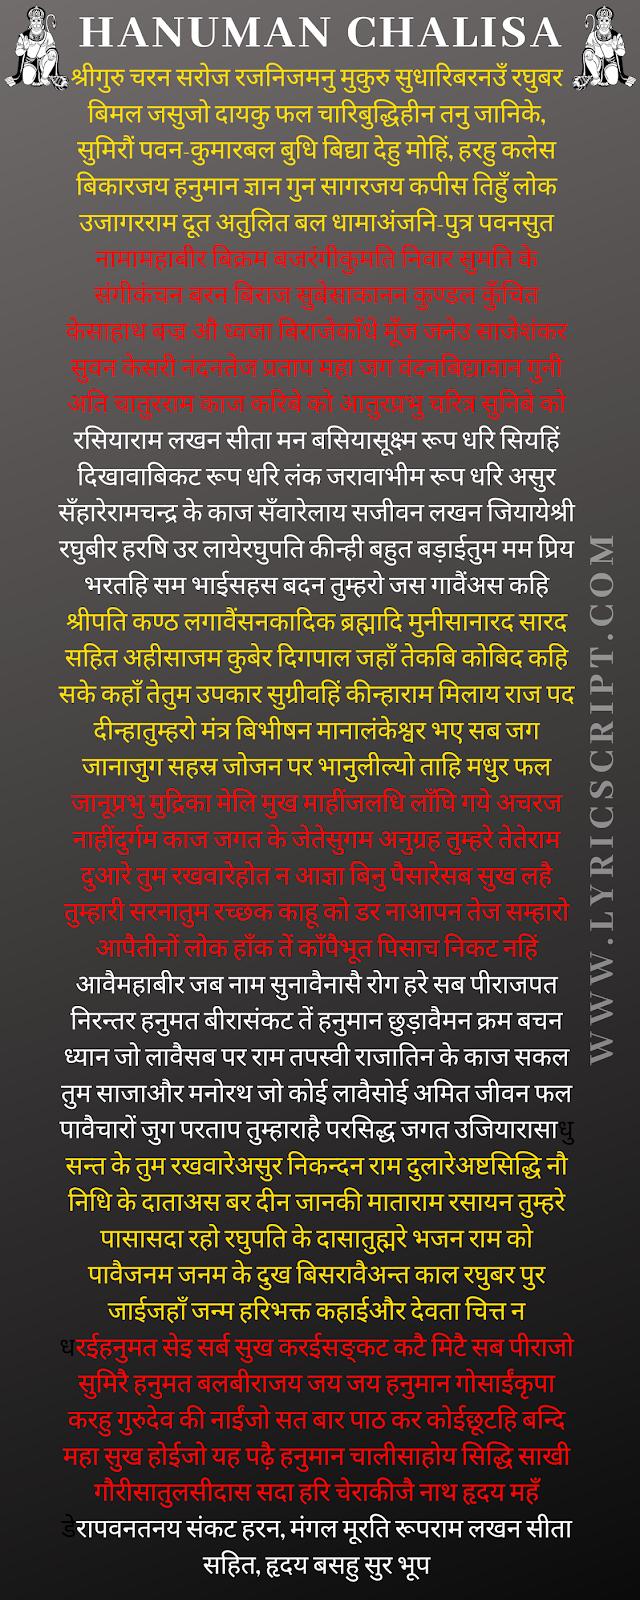 hanuman chalisa hindi lyrics image